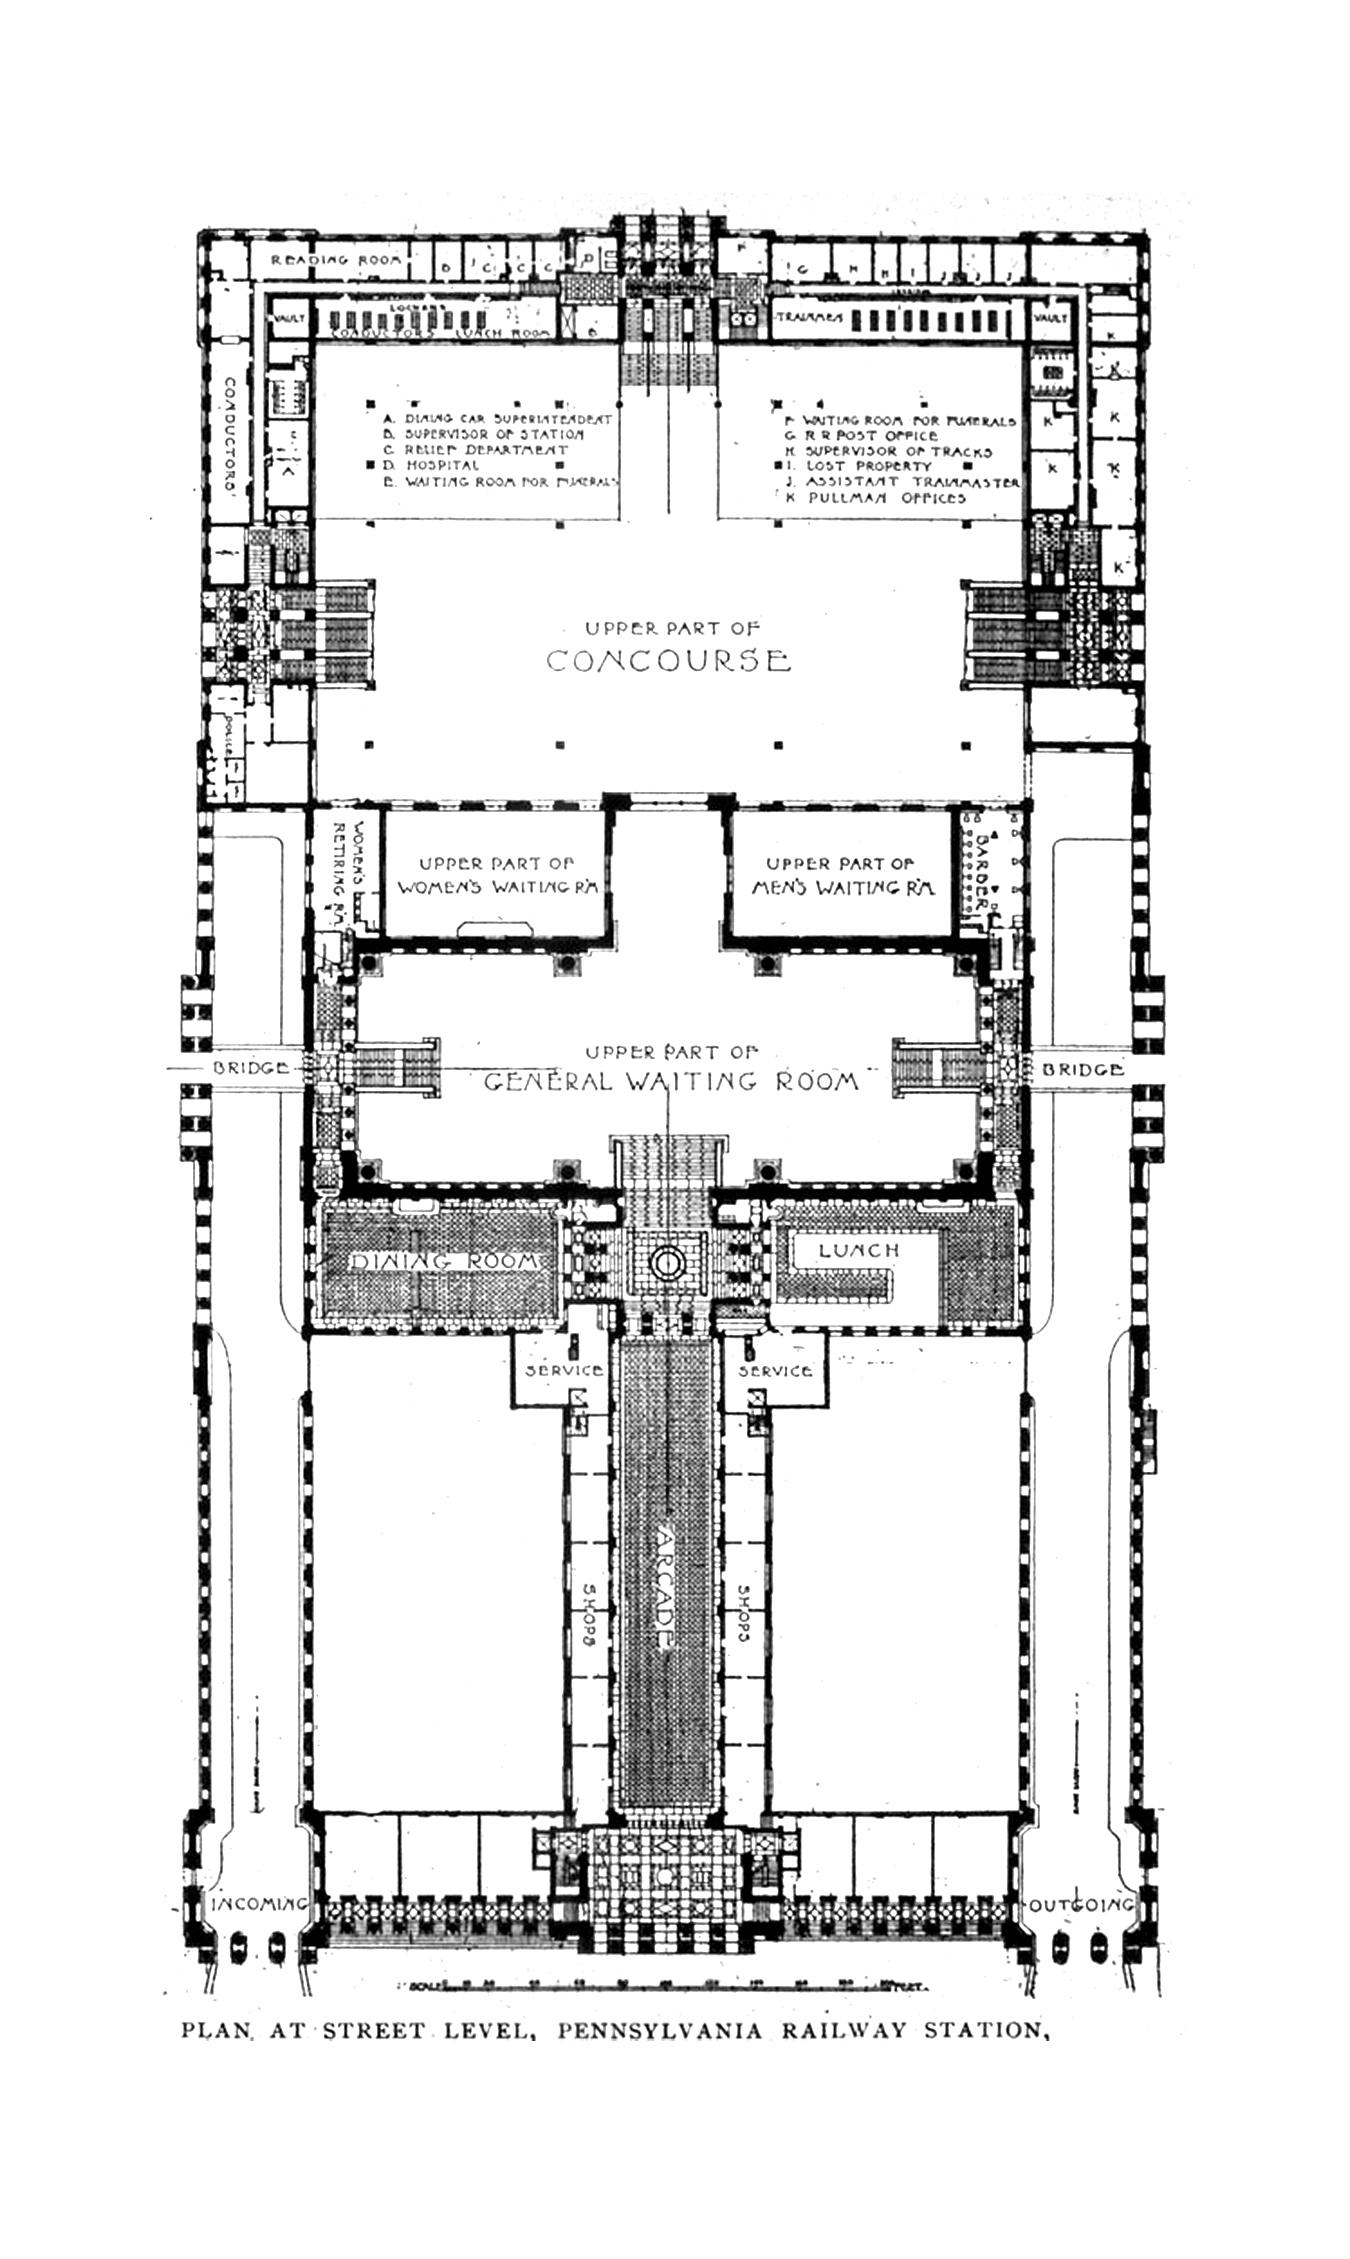 Pin By Sebastian Li On New York City Architecture In 2019